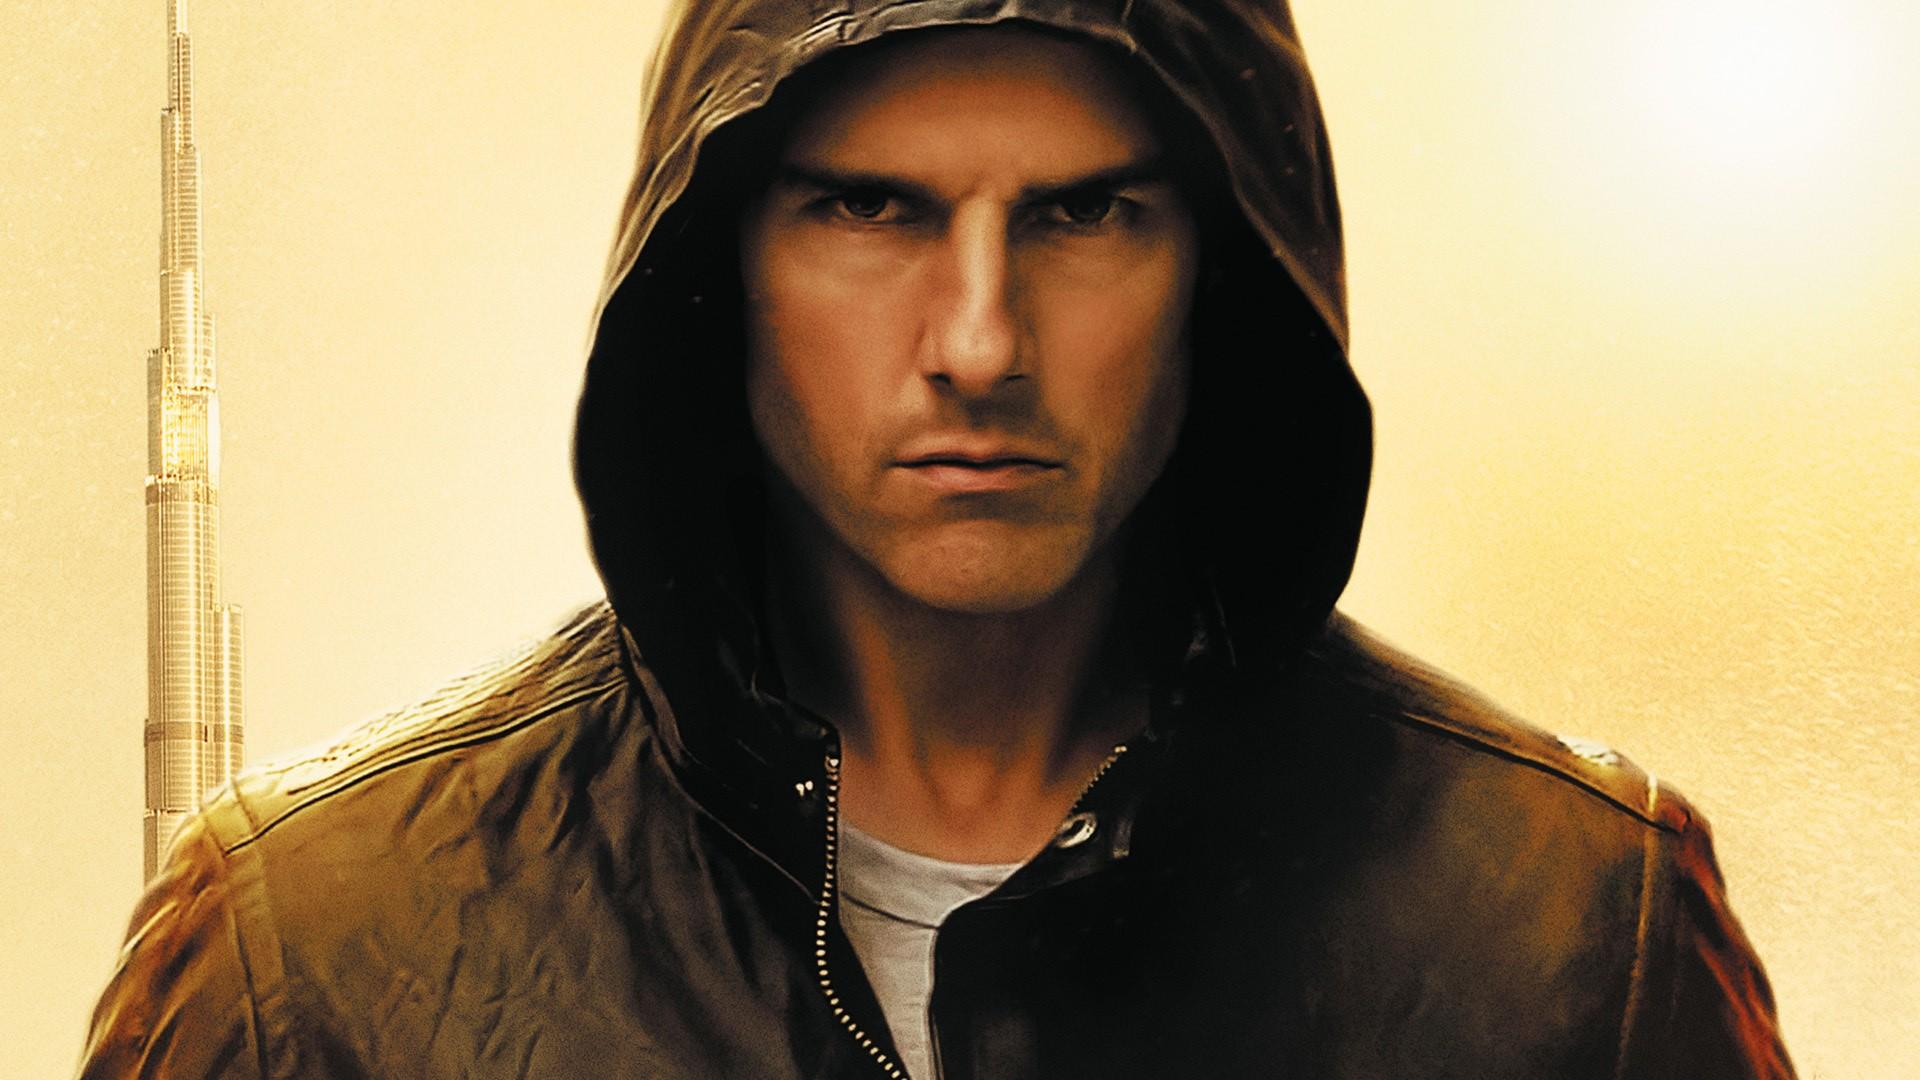 Tom Cruise Hd Wallpaper 6880702 1920x1080